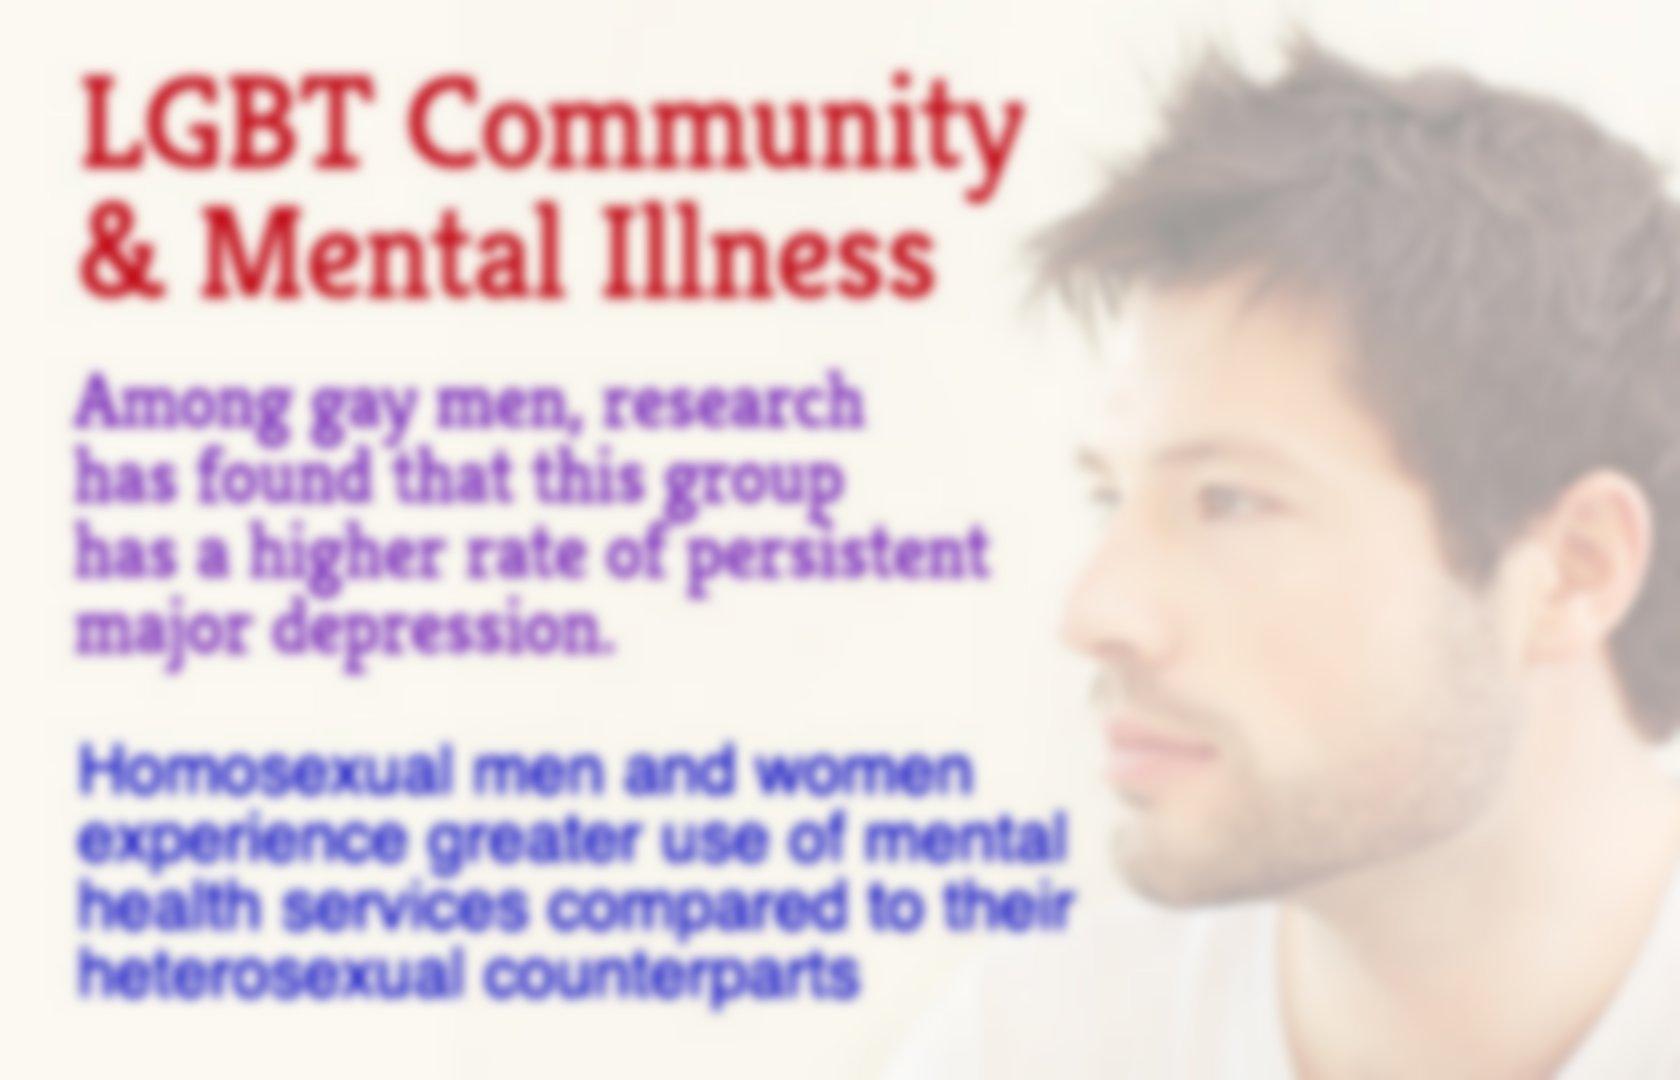 Homosexual mental health problems